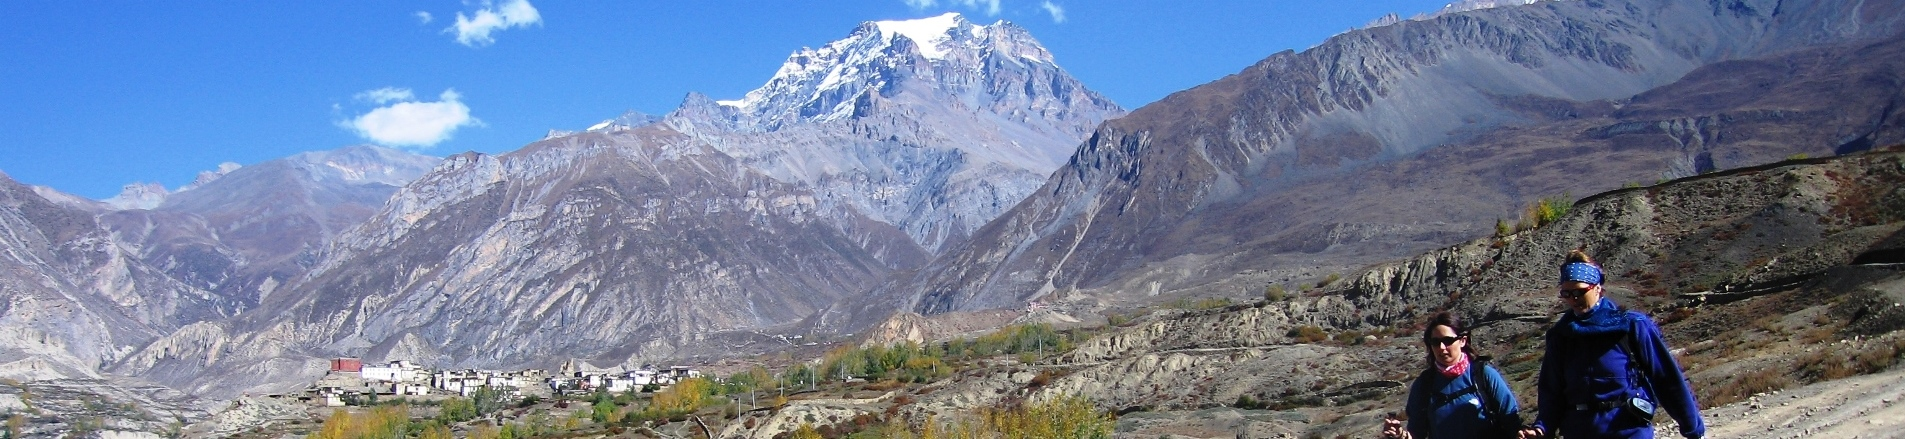 Anapurna-Treck-Okt.-2006-159